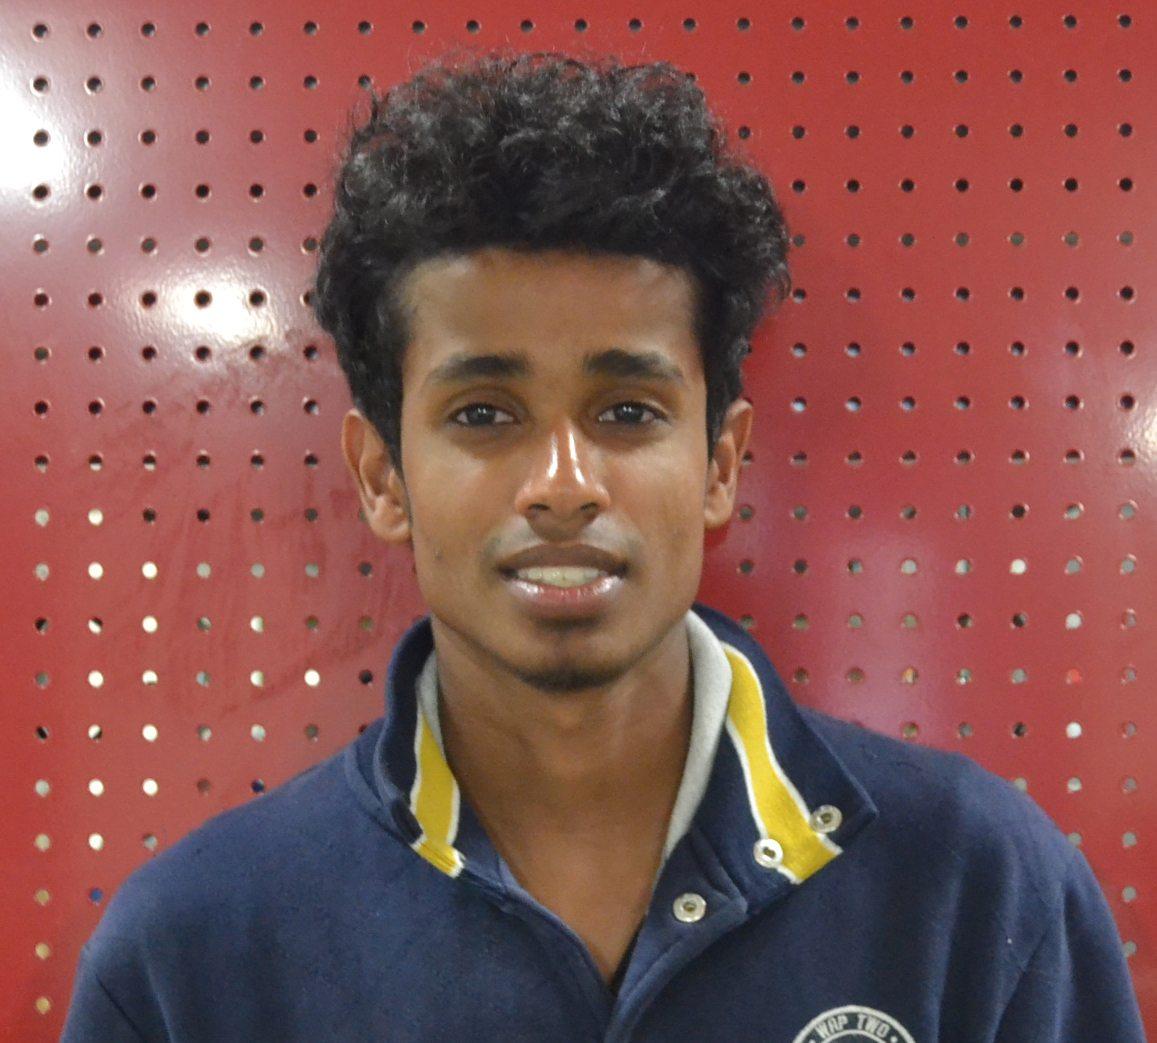 Noel Sathiyaseelan